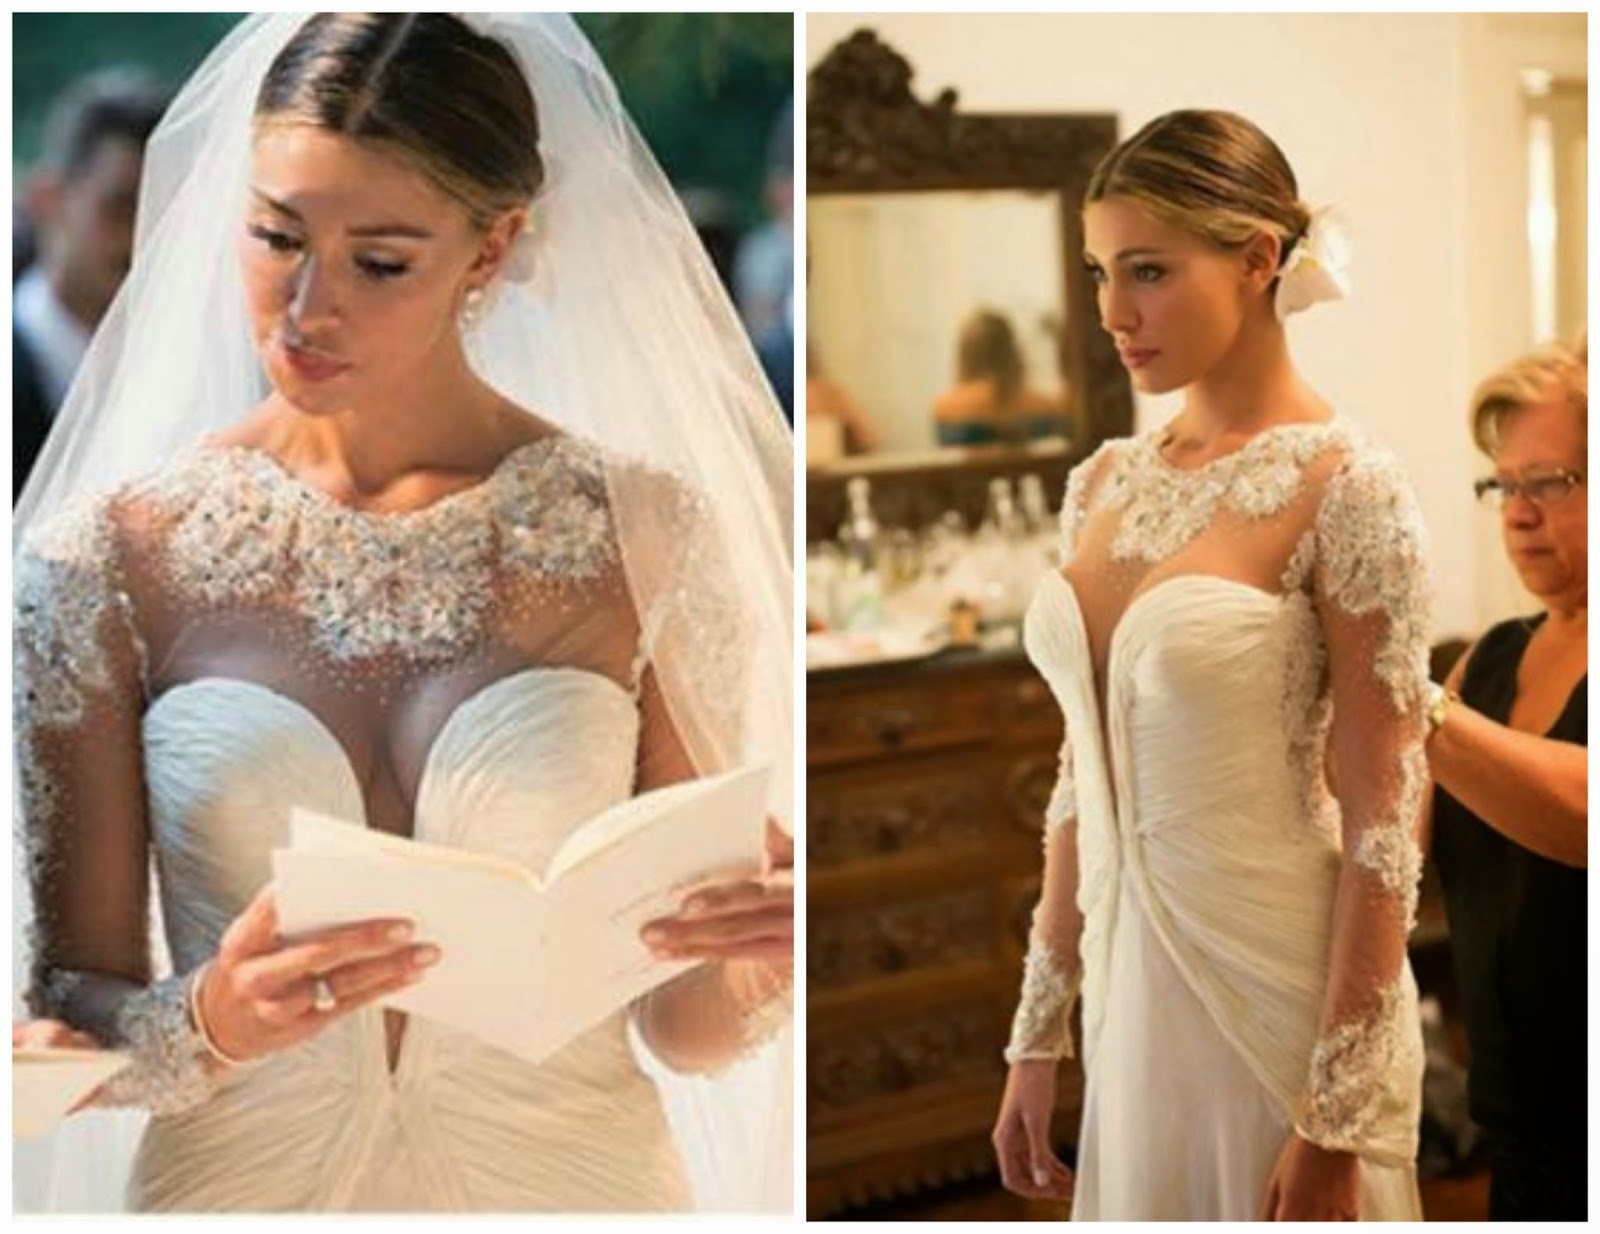 e09895448601 Abito da Sposa Matrimonio Belen Rodriguez Abito da Sposa Matrimonio Belen  Rodriguez